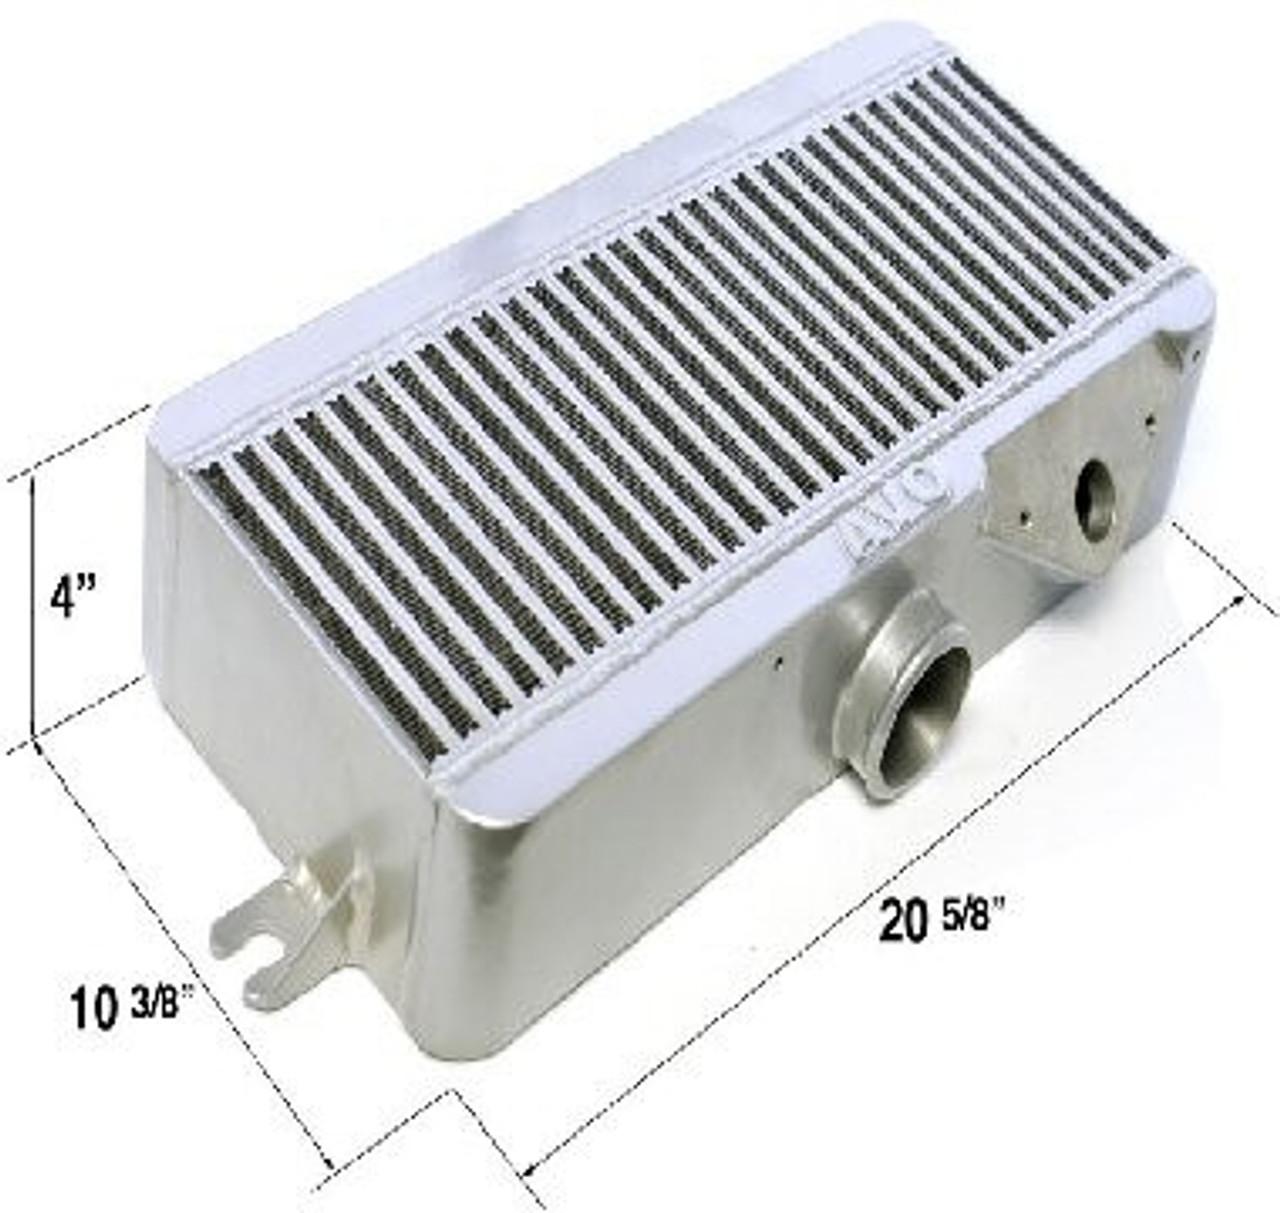 IntercoolerTop Mount Intercooler Kit Impreza STI EJ25 S2F14G94A001T